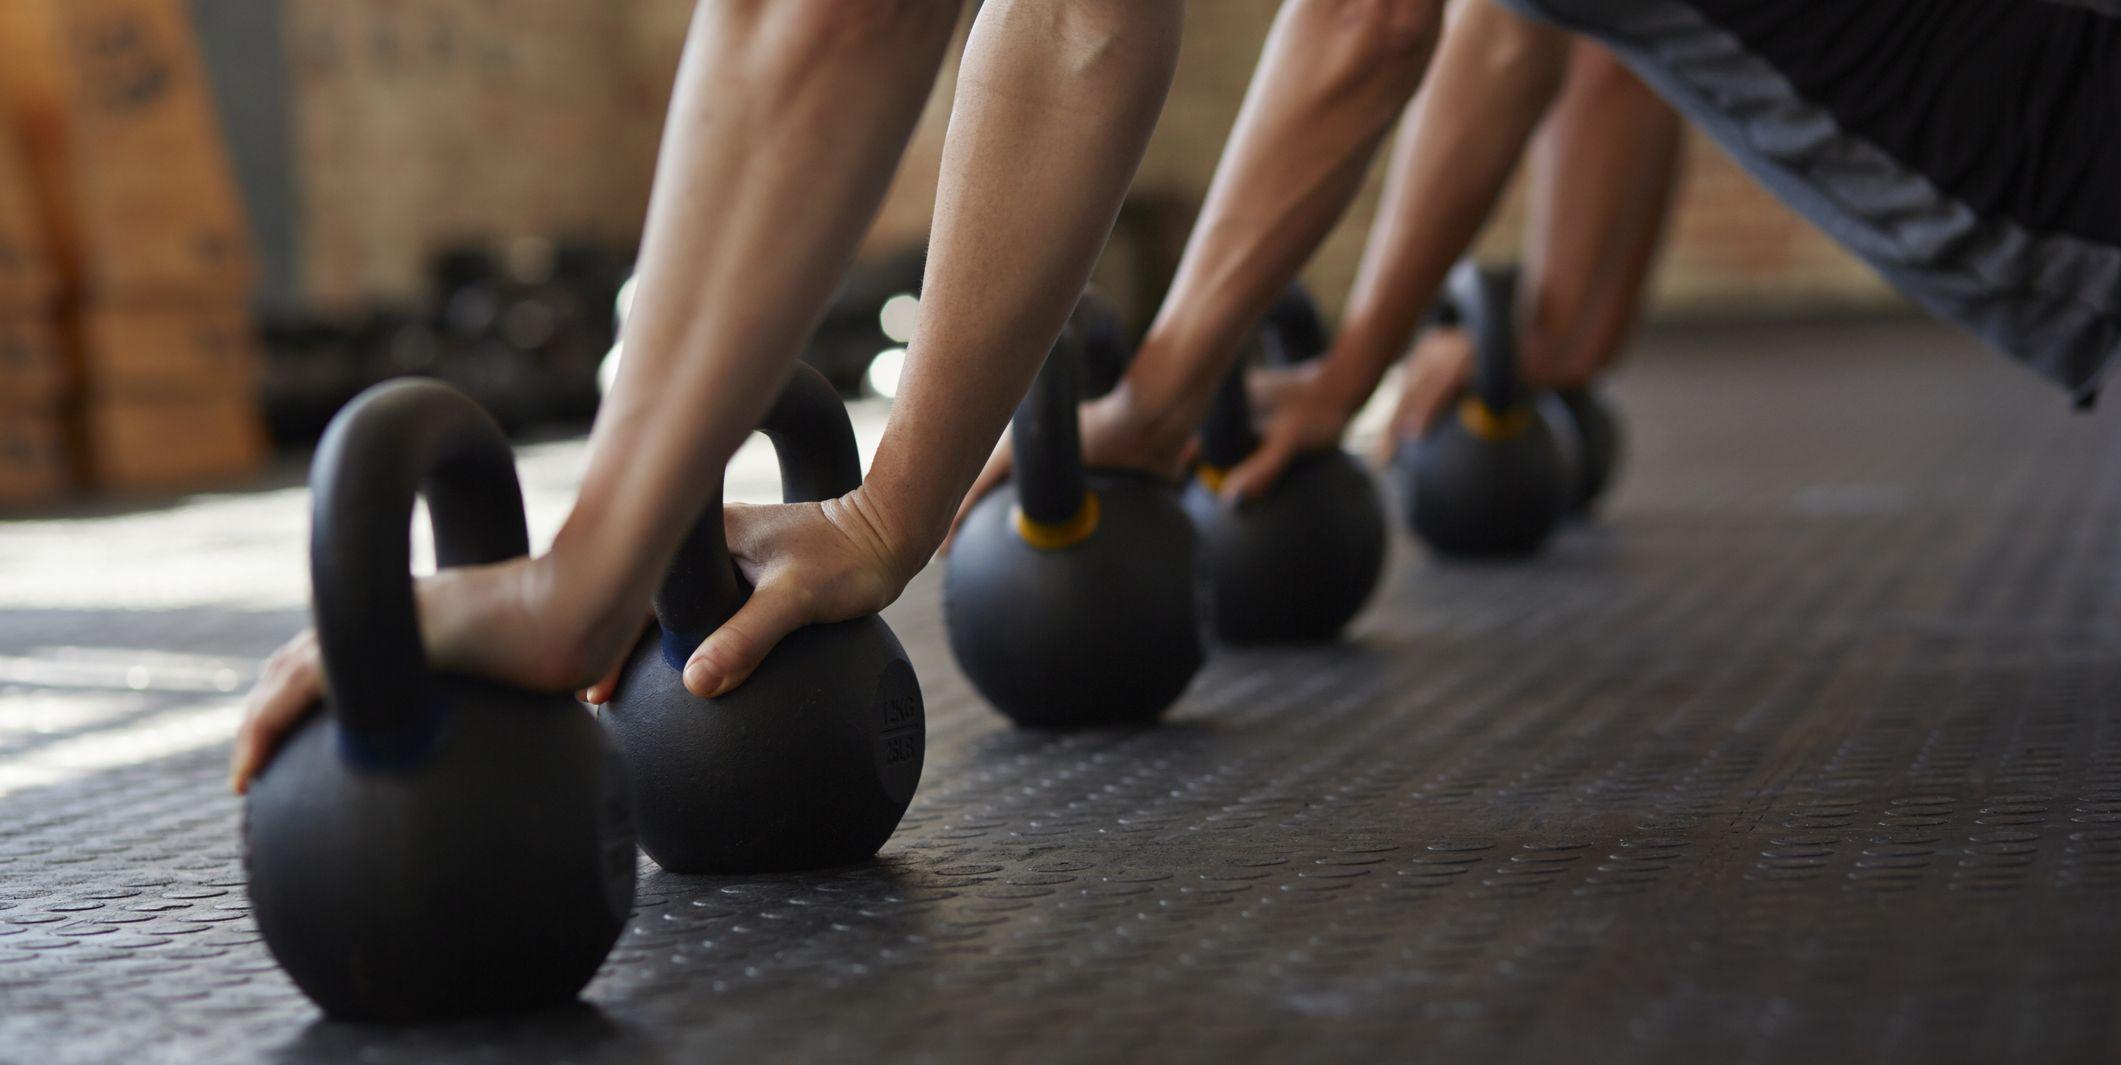 kettlebell push up group workout